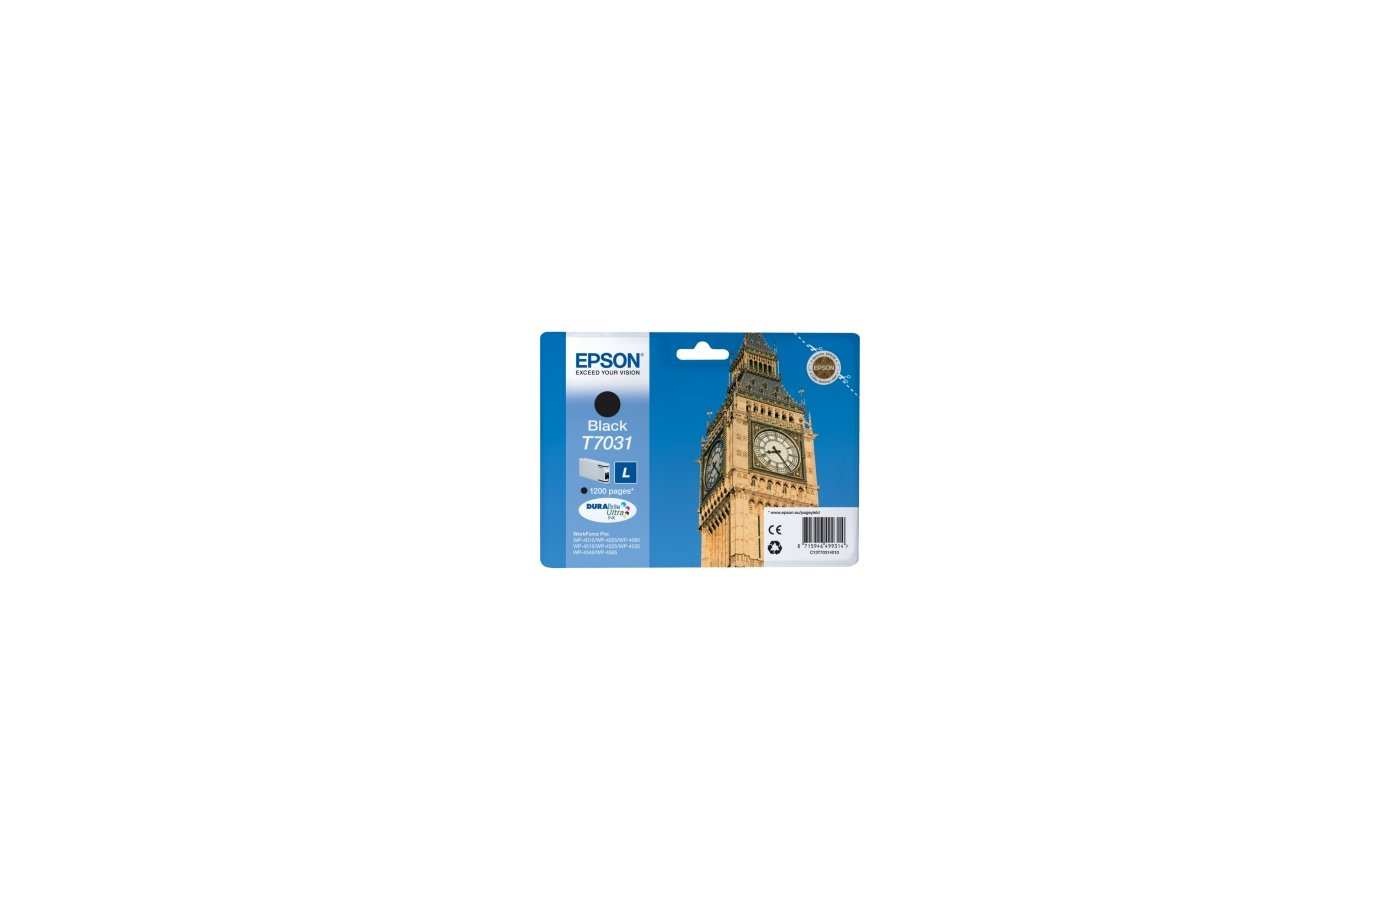 Картридж струйный Epson C13T70314010 картридж (Black для WP-4000/5000 series,L 1.2k (черный))